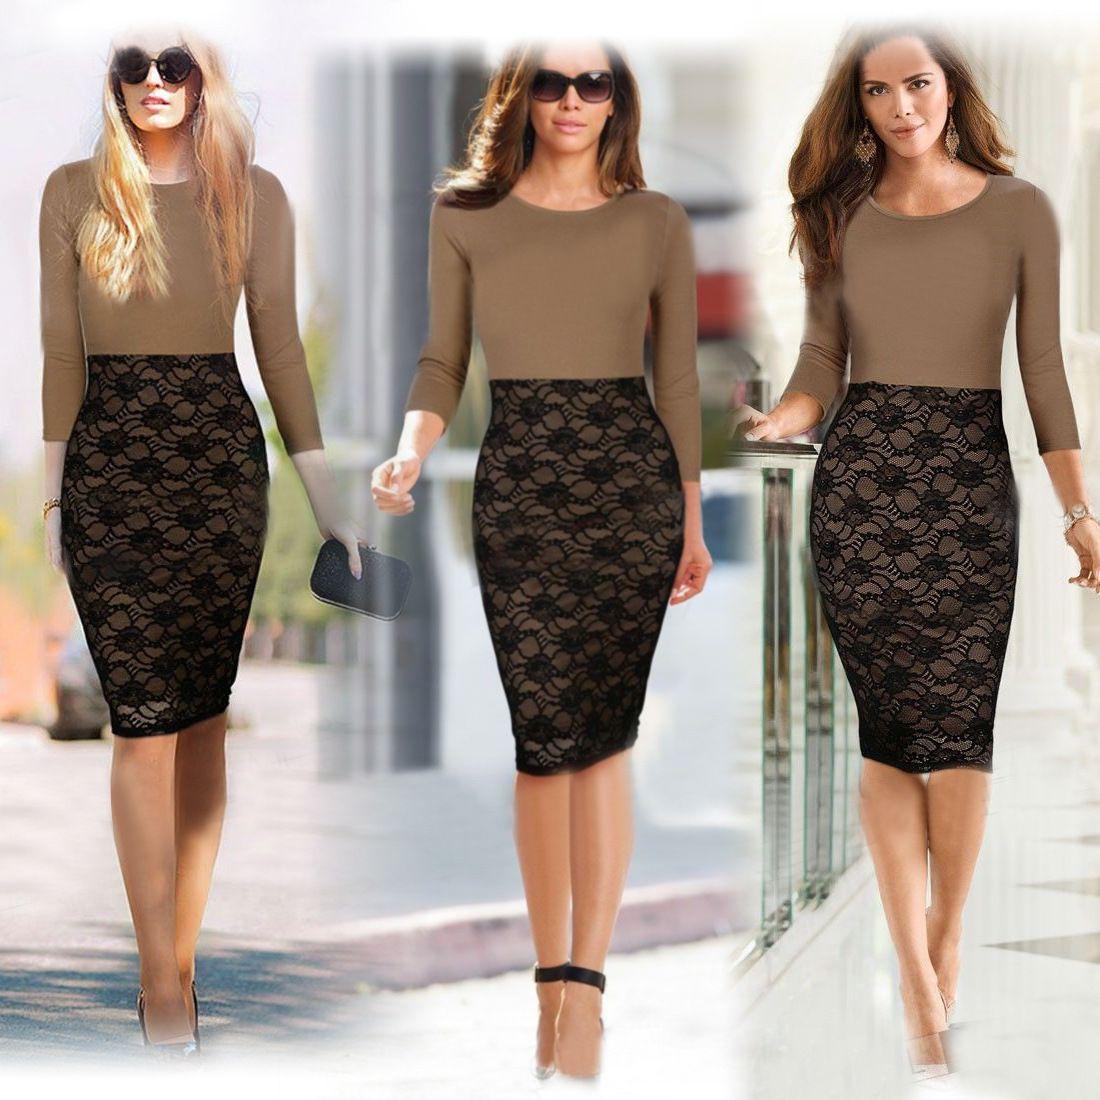 25-shades-of-grey-women-office-wear-ideas-20 | Styleoholic